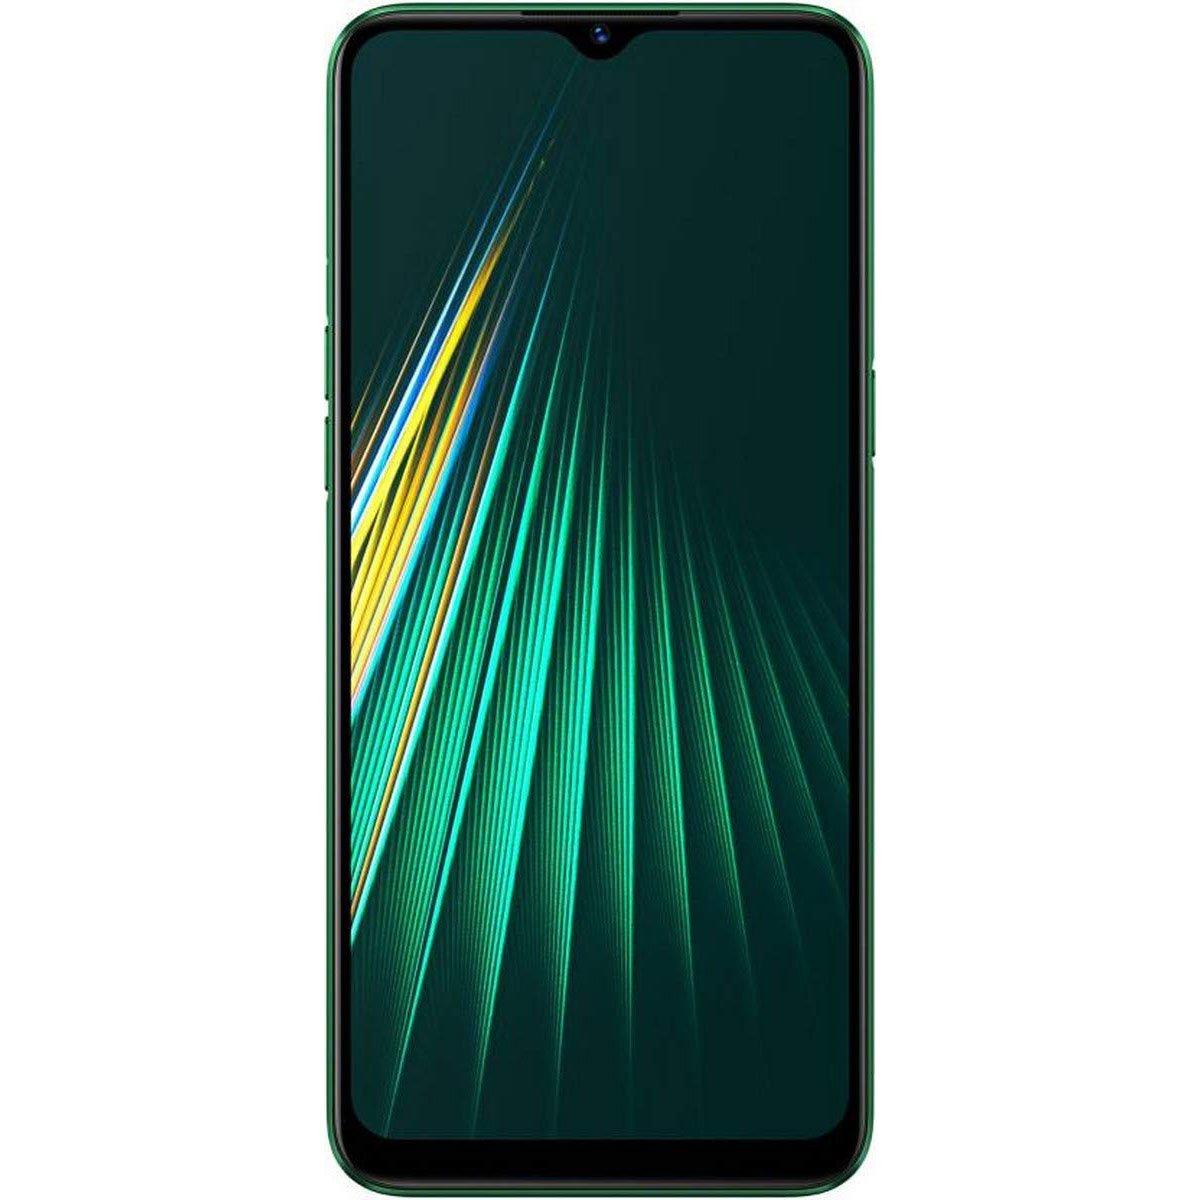 Telefon mobil Realme 5i, Dual SIM, 64GB, 4GB RAM, 4G, Forest Green